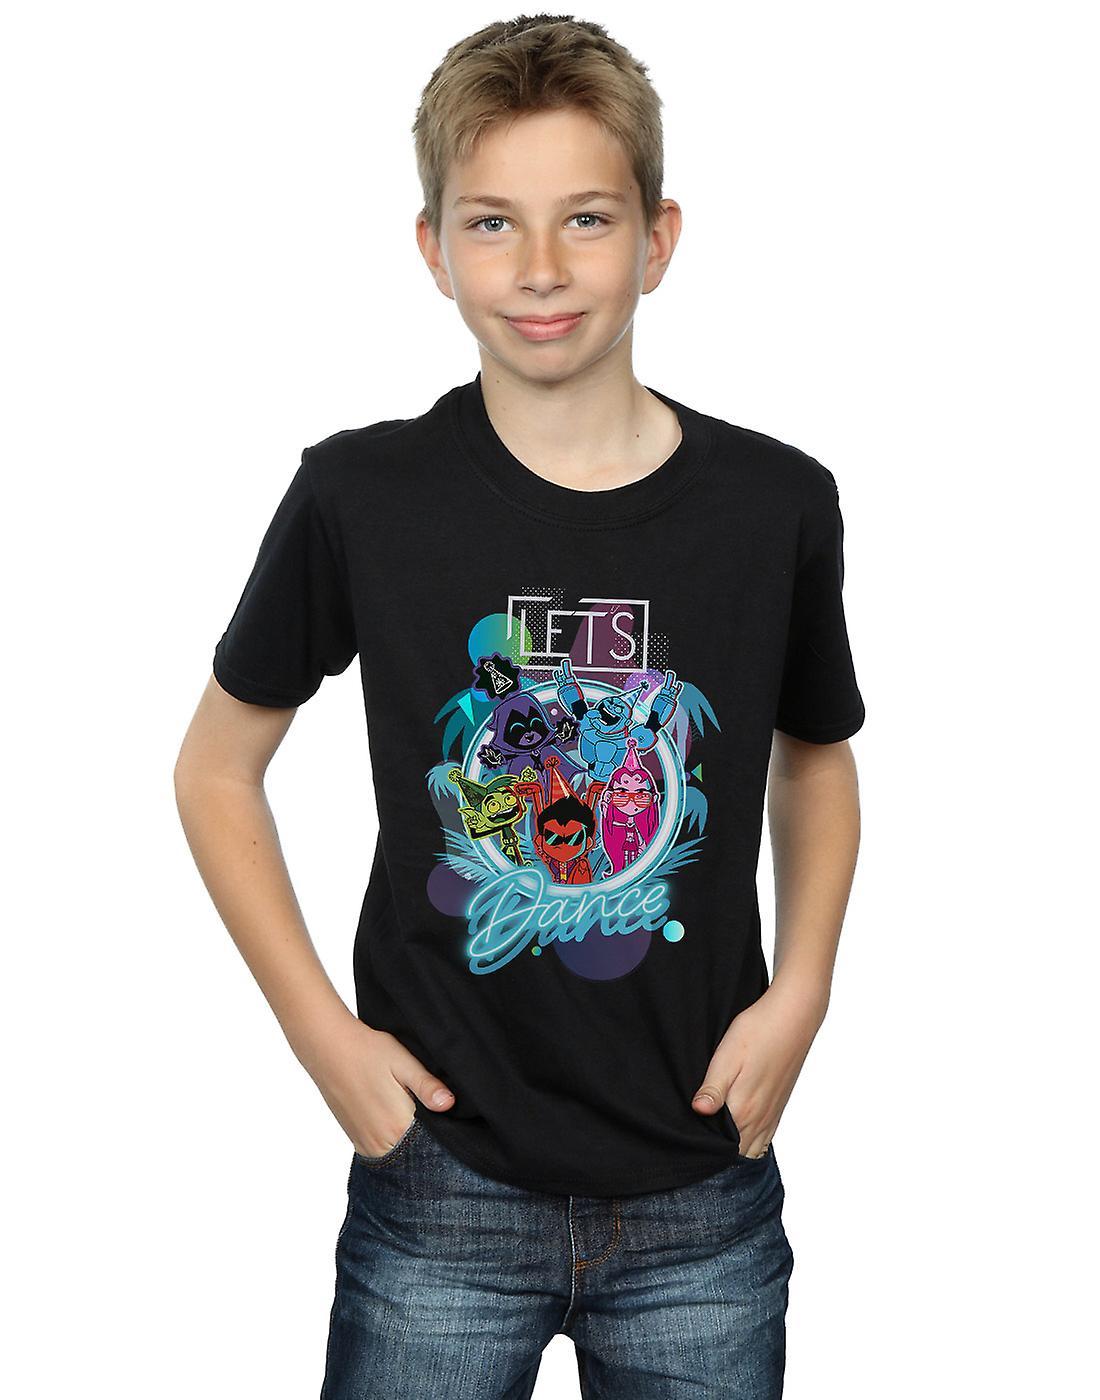 DC Comics Boys Teen Titans Go Let's Dance T-Shirt